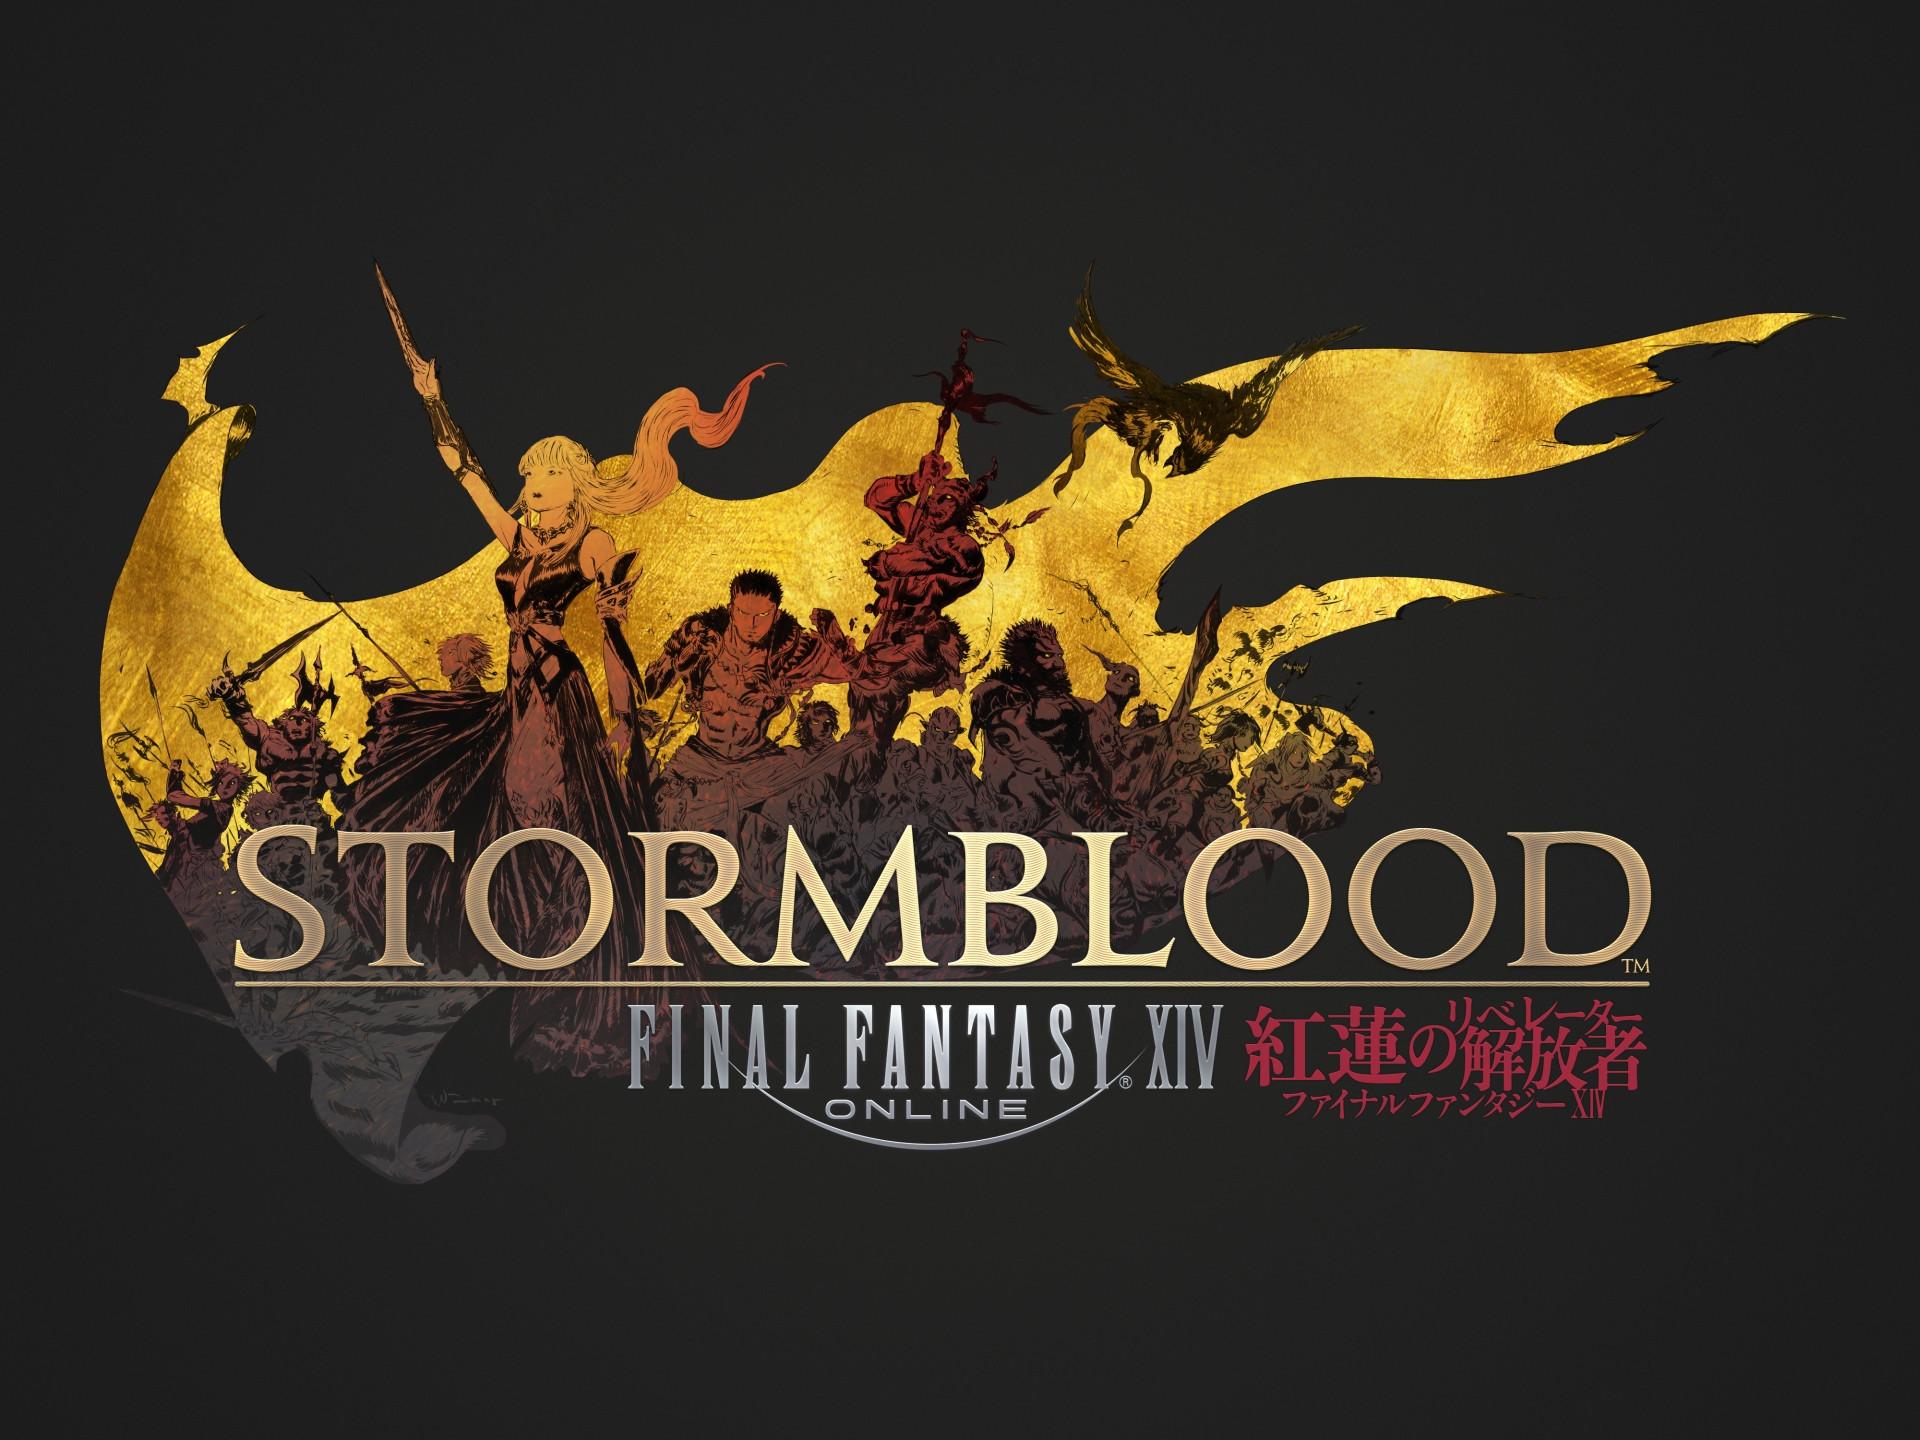 Final Fantasy XIV: Stormblood | Final Fantasy Wiki | FANDOM powered by Wikia